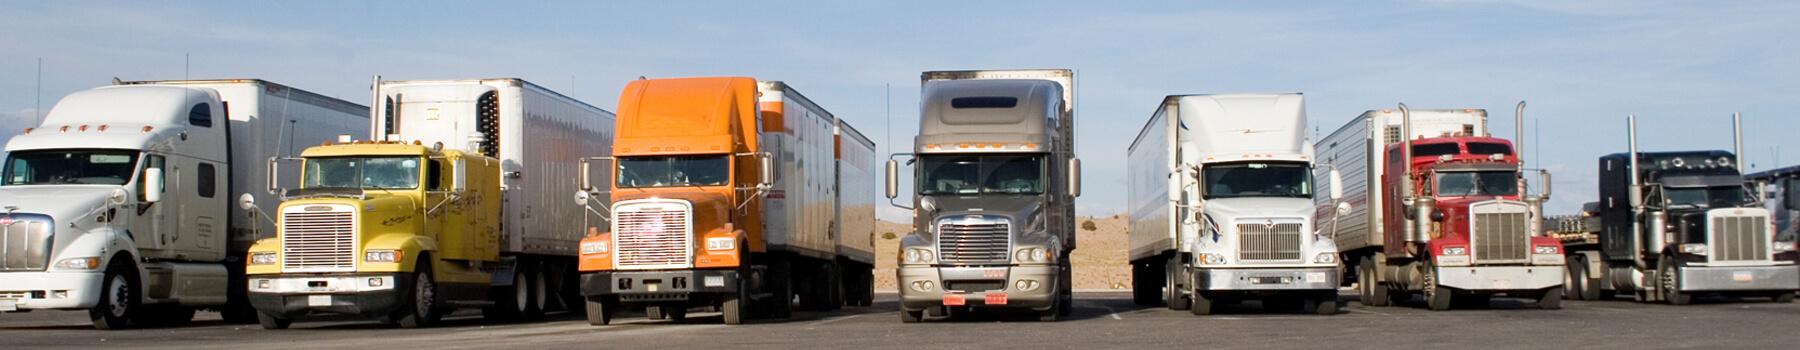 Supercheap Interstate Removals